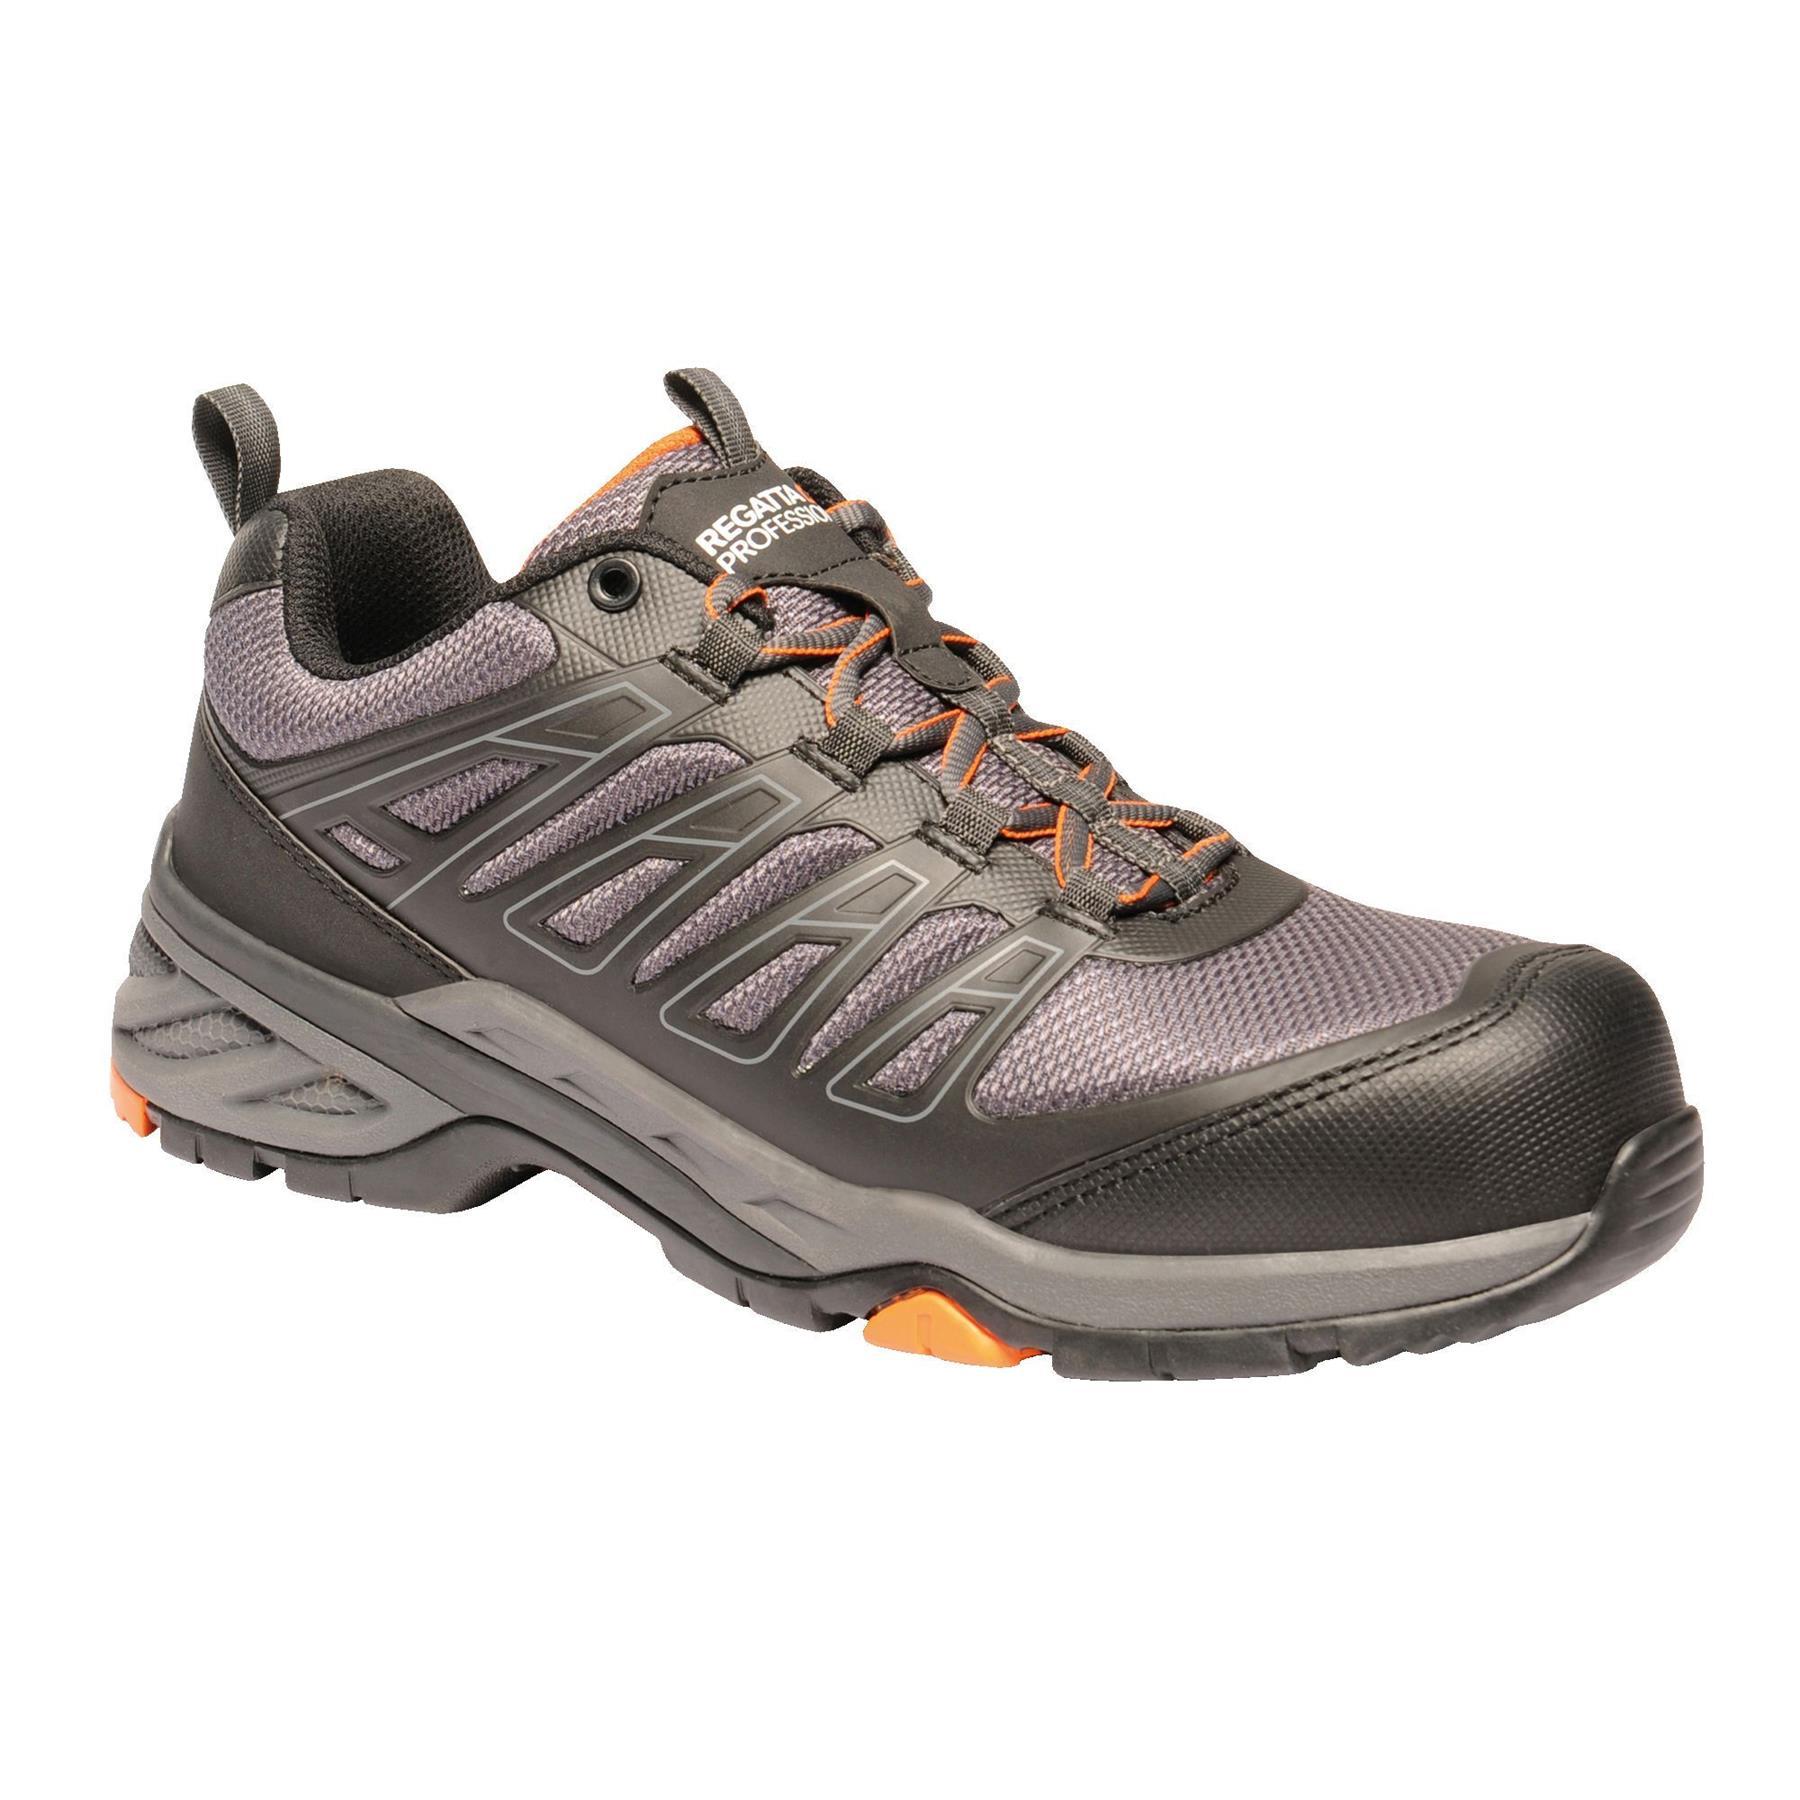 miniatuur 19 - Regatta Mens Work Safety Protective Shoes Steel Toe Cap Boots Workwear